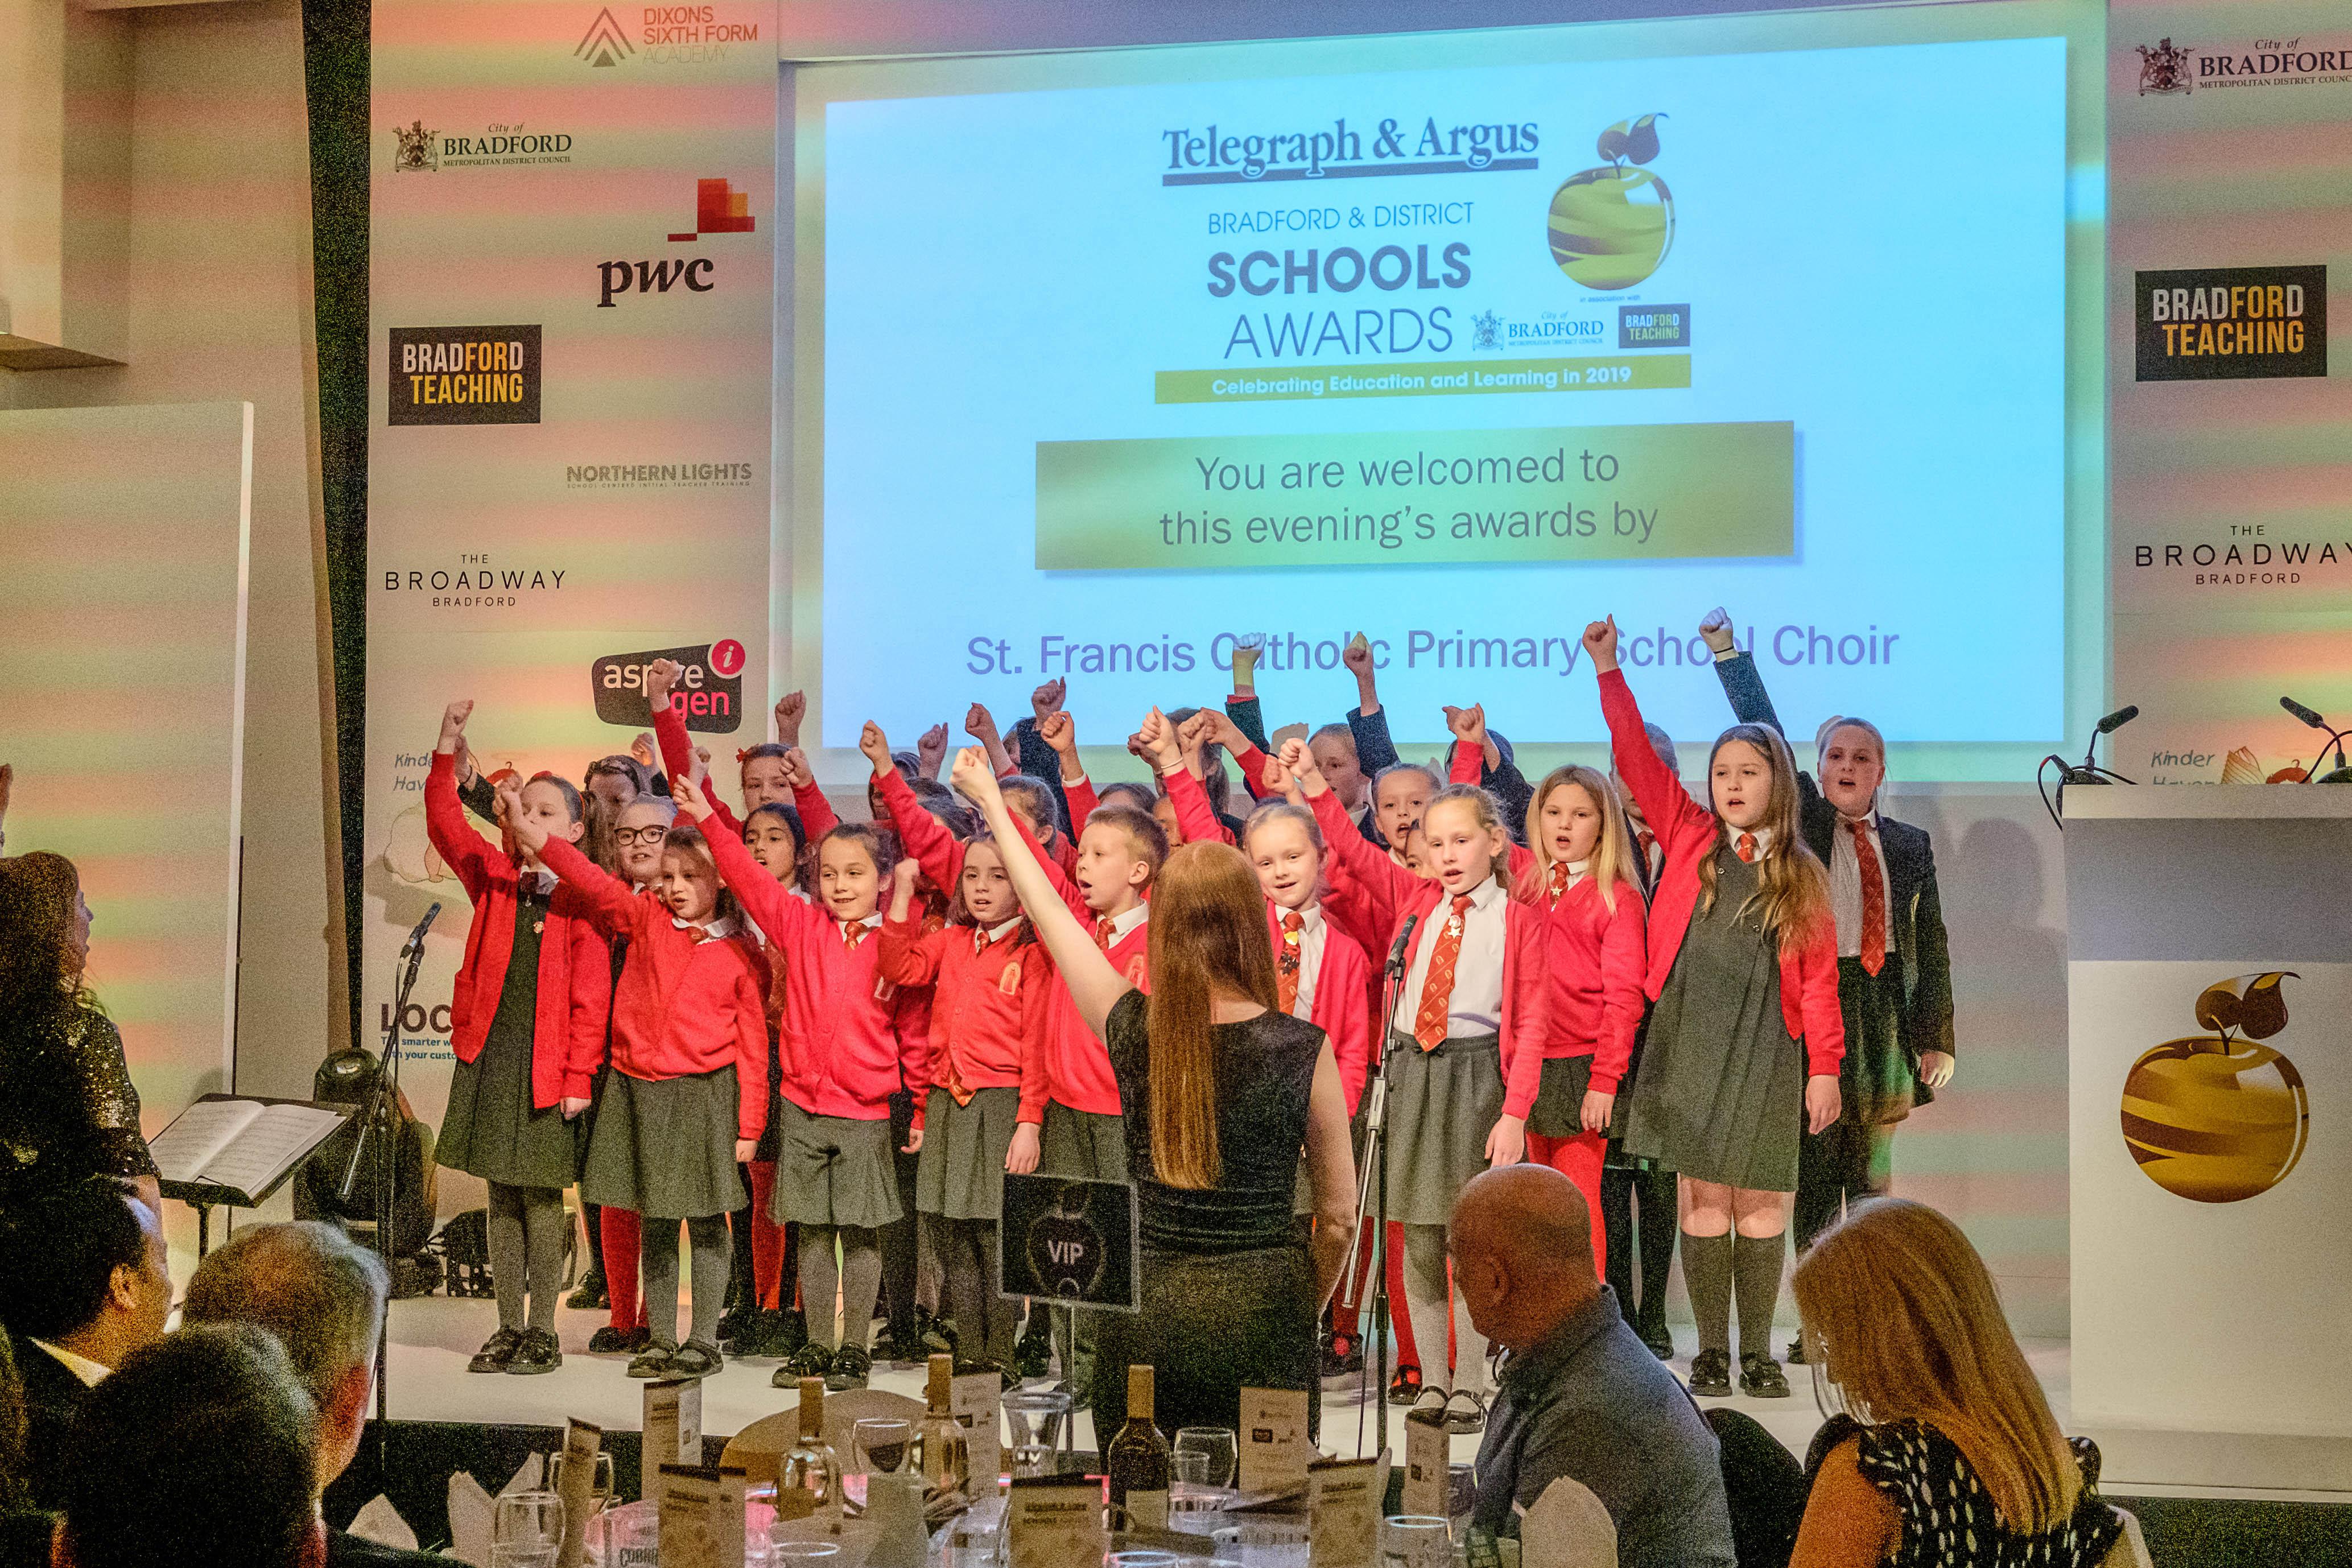 Schools Awards 2019